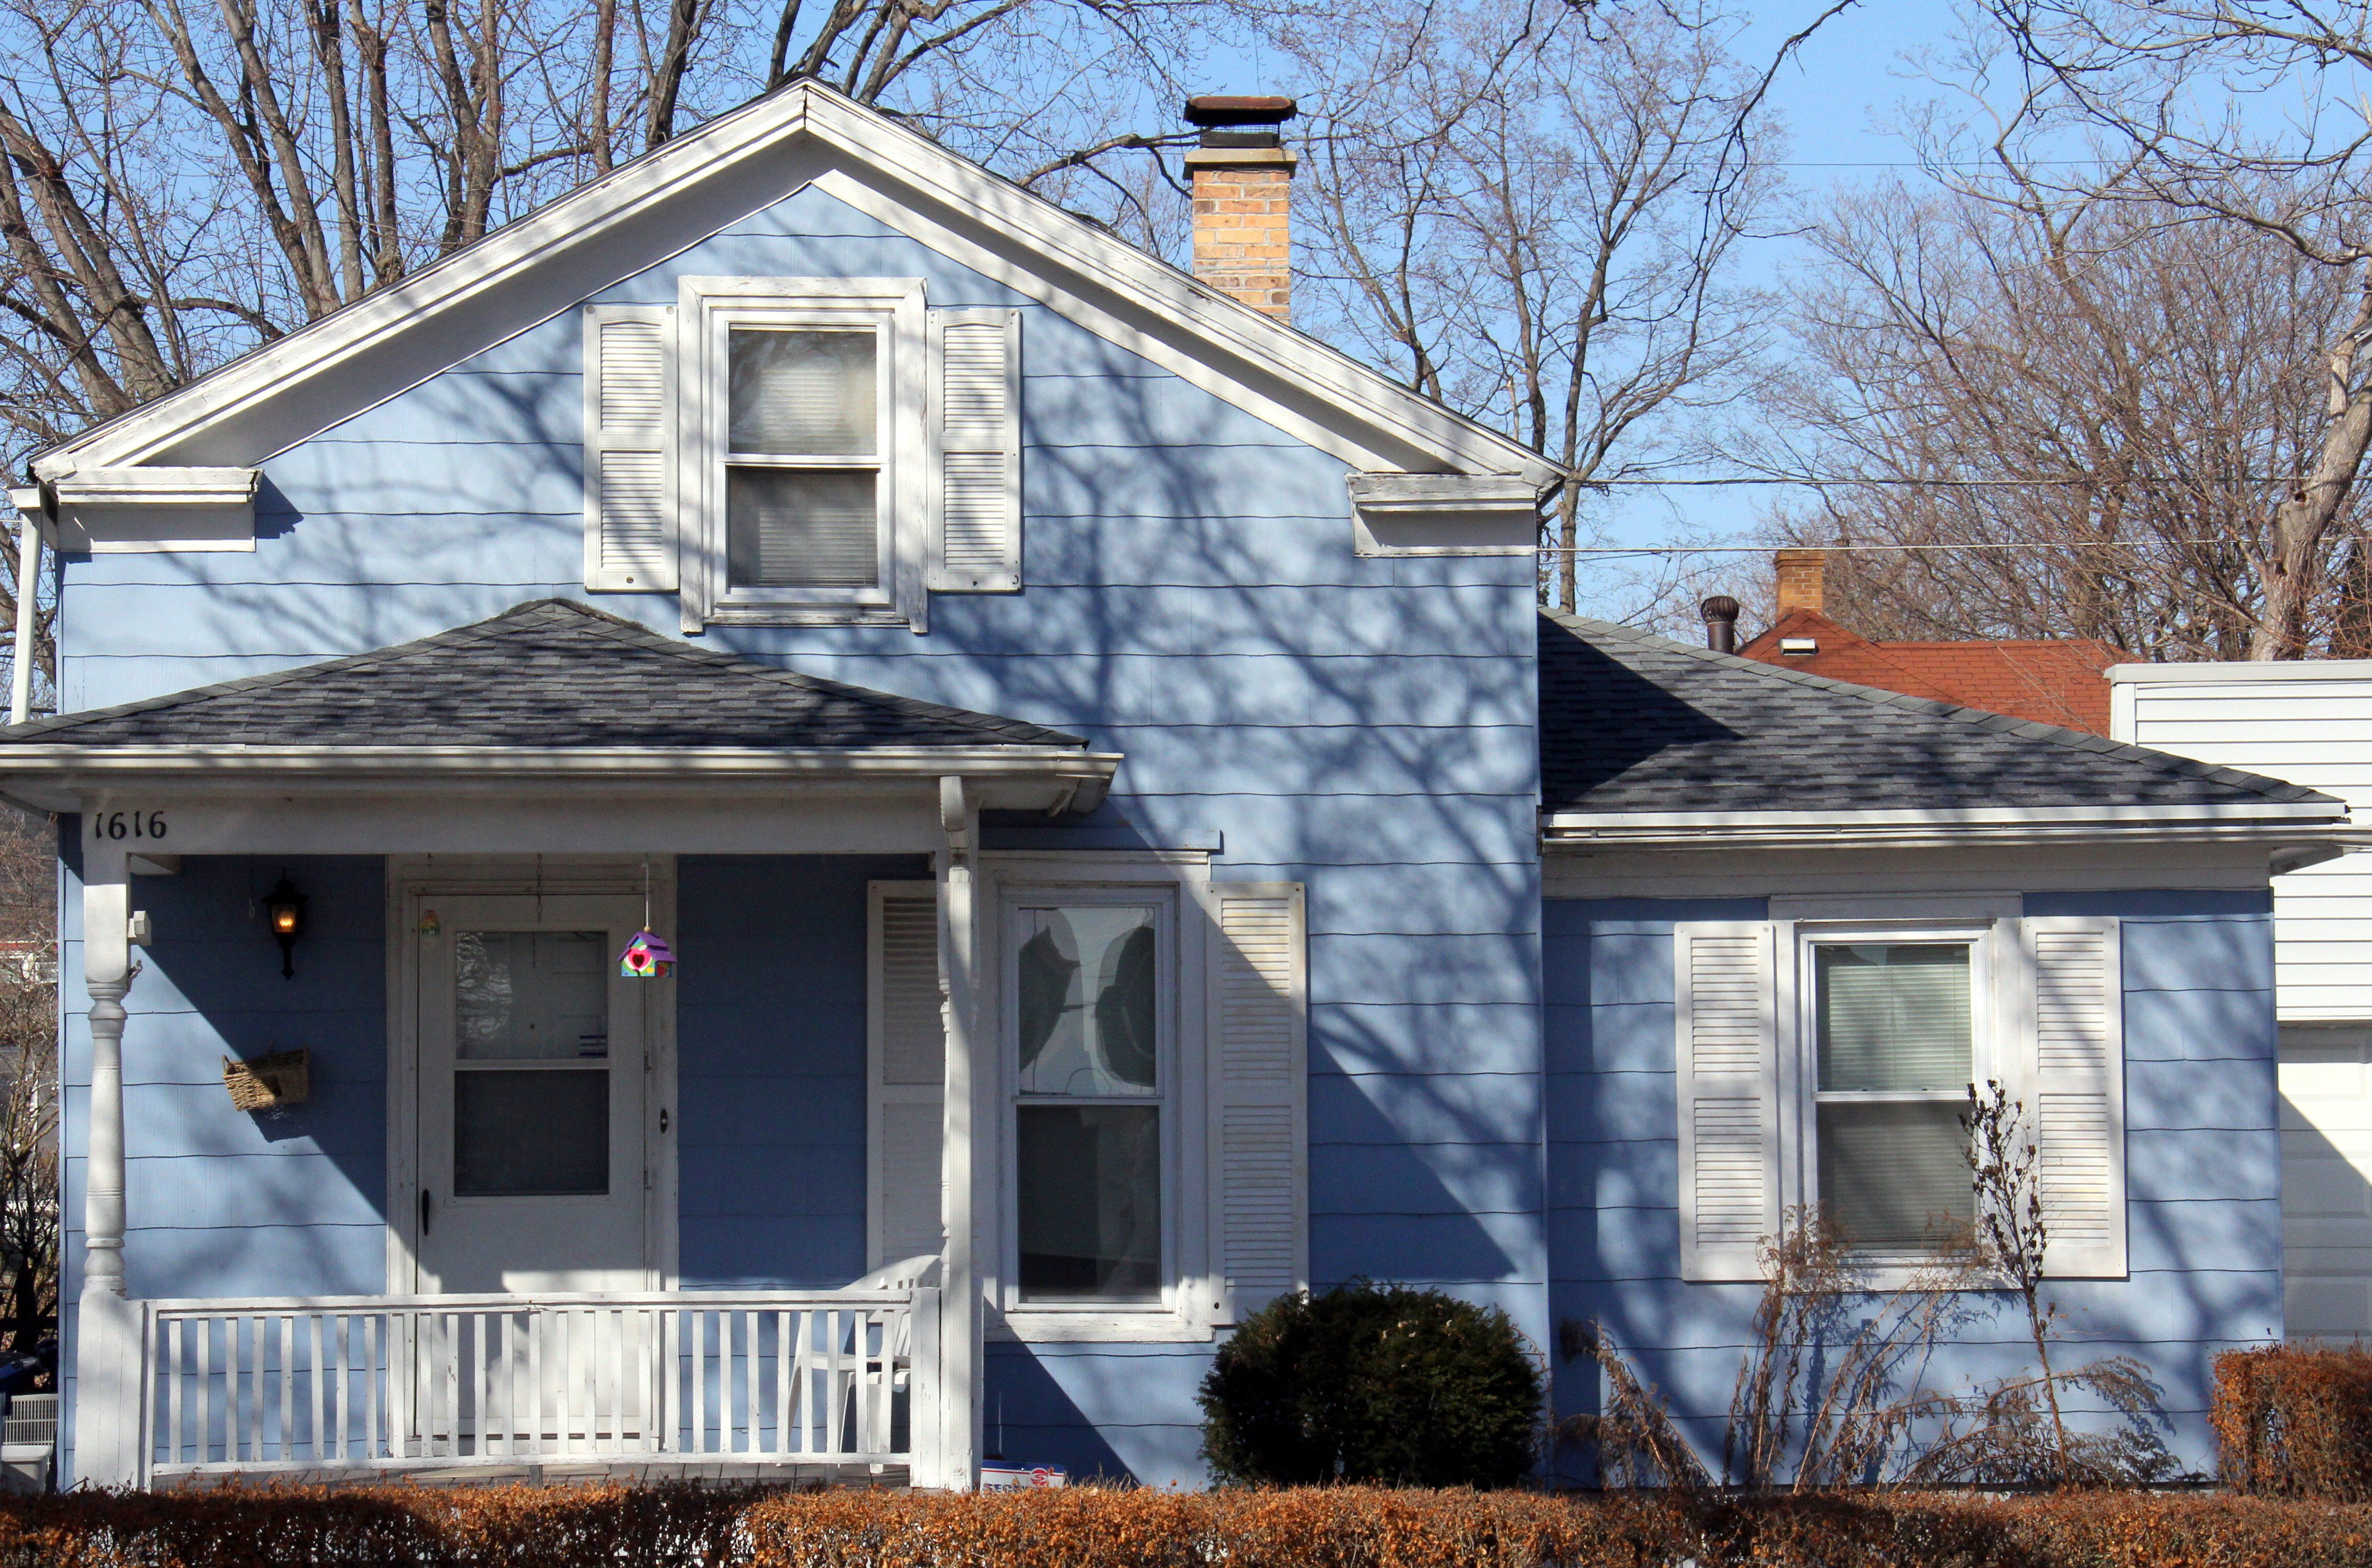 Blue House, Front Gable, Cornice Returns